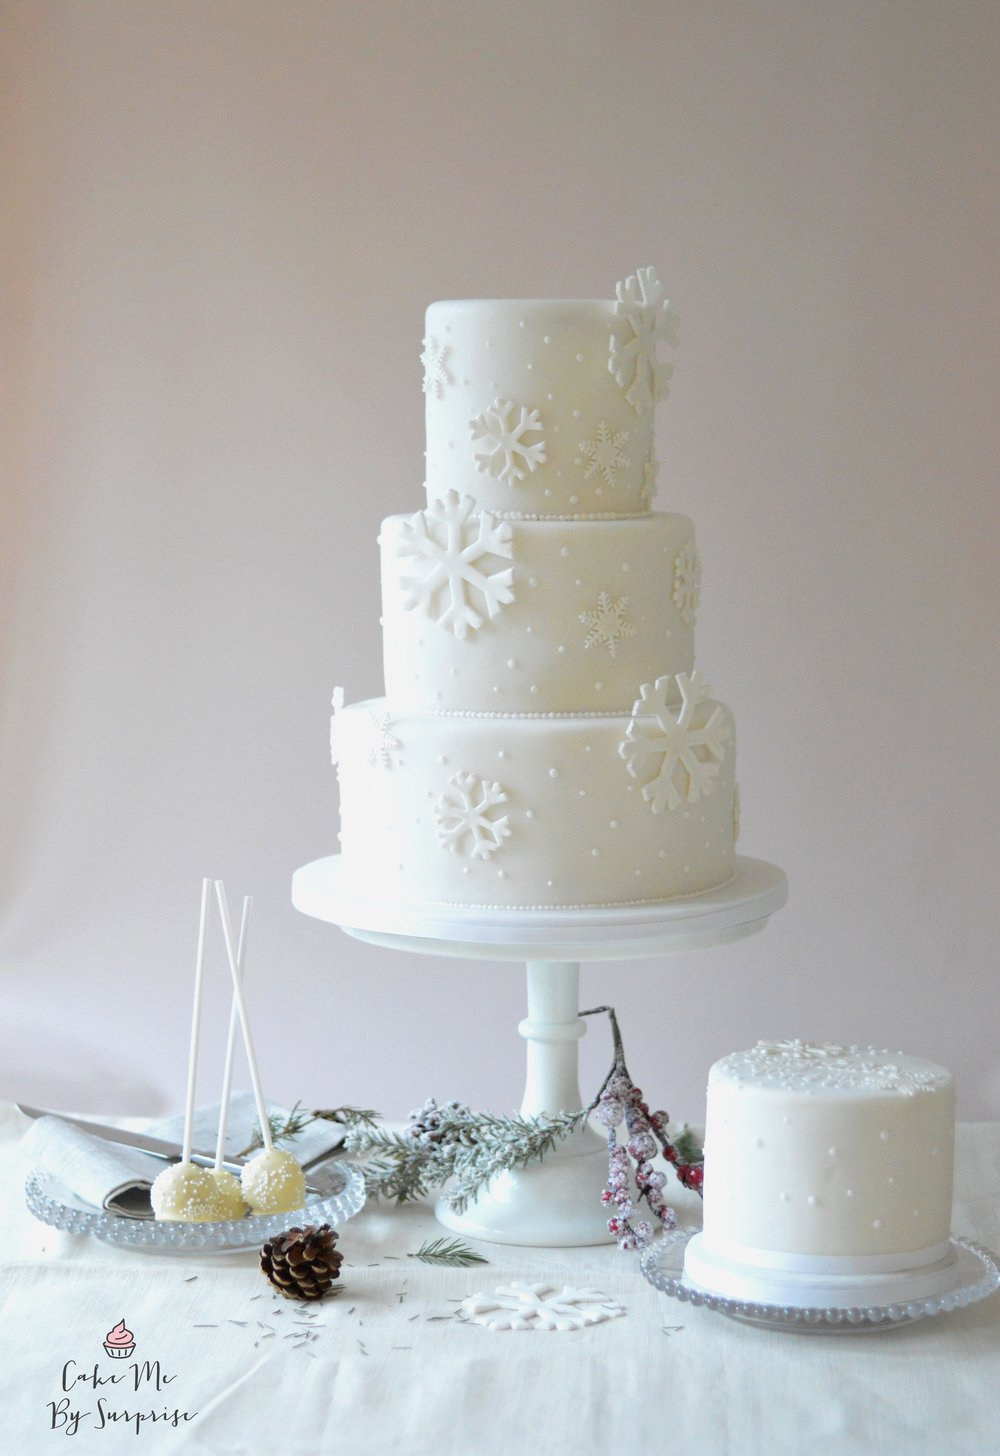 £500 (Serves 100) *Cake Price Only